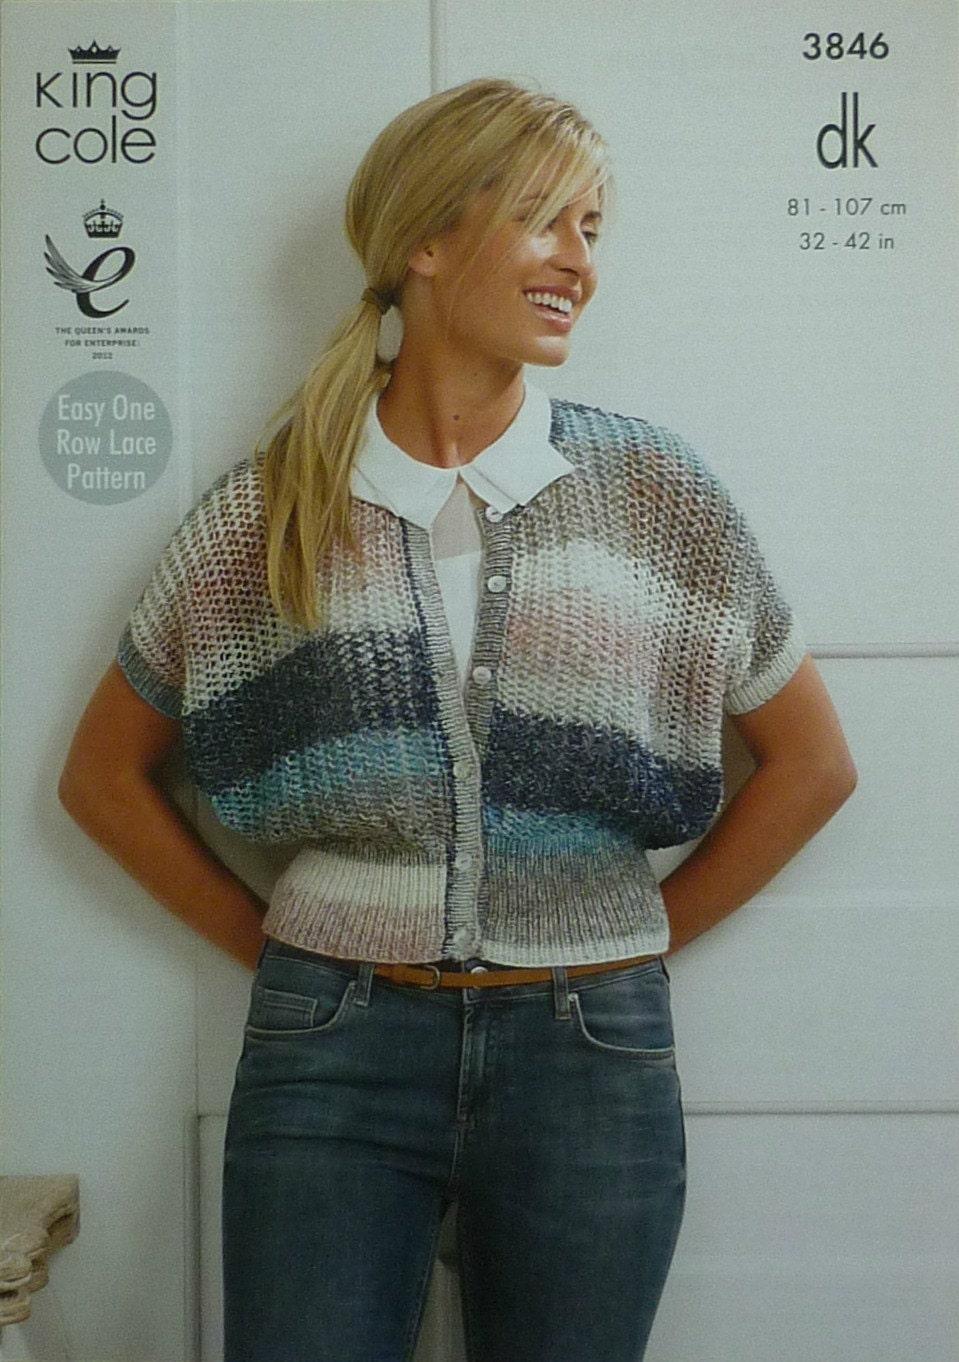 Womens knitting pattern k3846 ladies drop sleeve round neck easy womens knitting pattern k3846 ladies drop sleeve round neck easy lacy cardigan knitting pattern dk light worsted king olec bankloansurffo Image collections